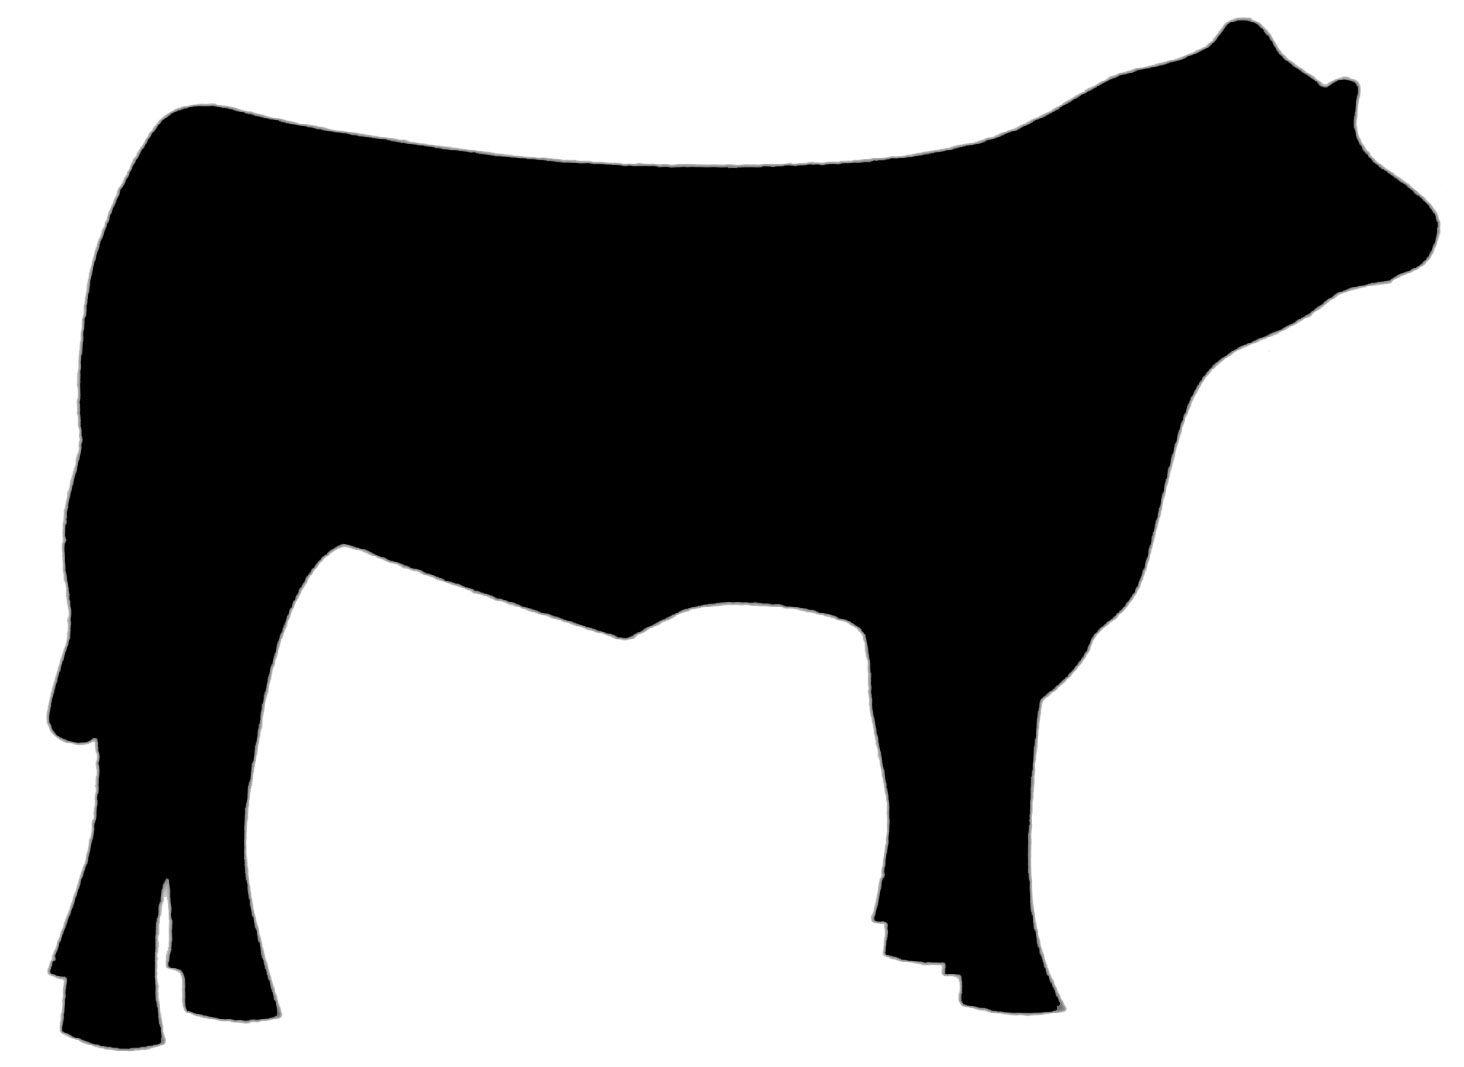 Beef clipart silhouette. Panda at getdrawings com